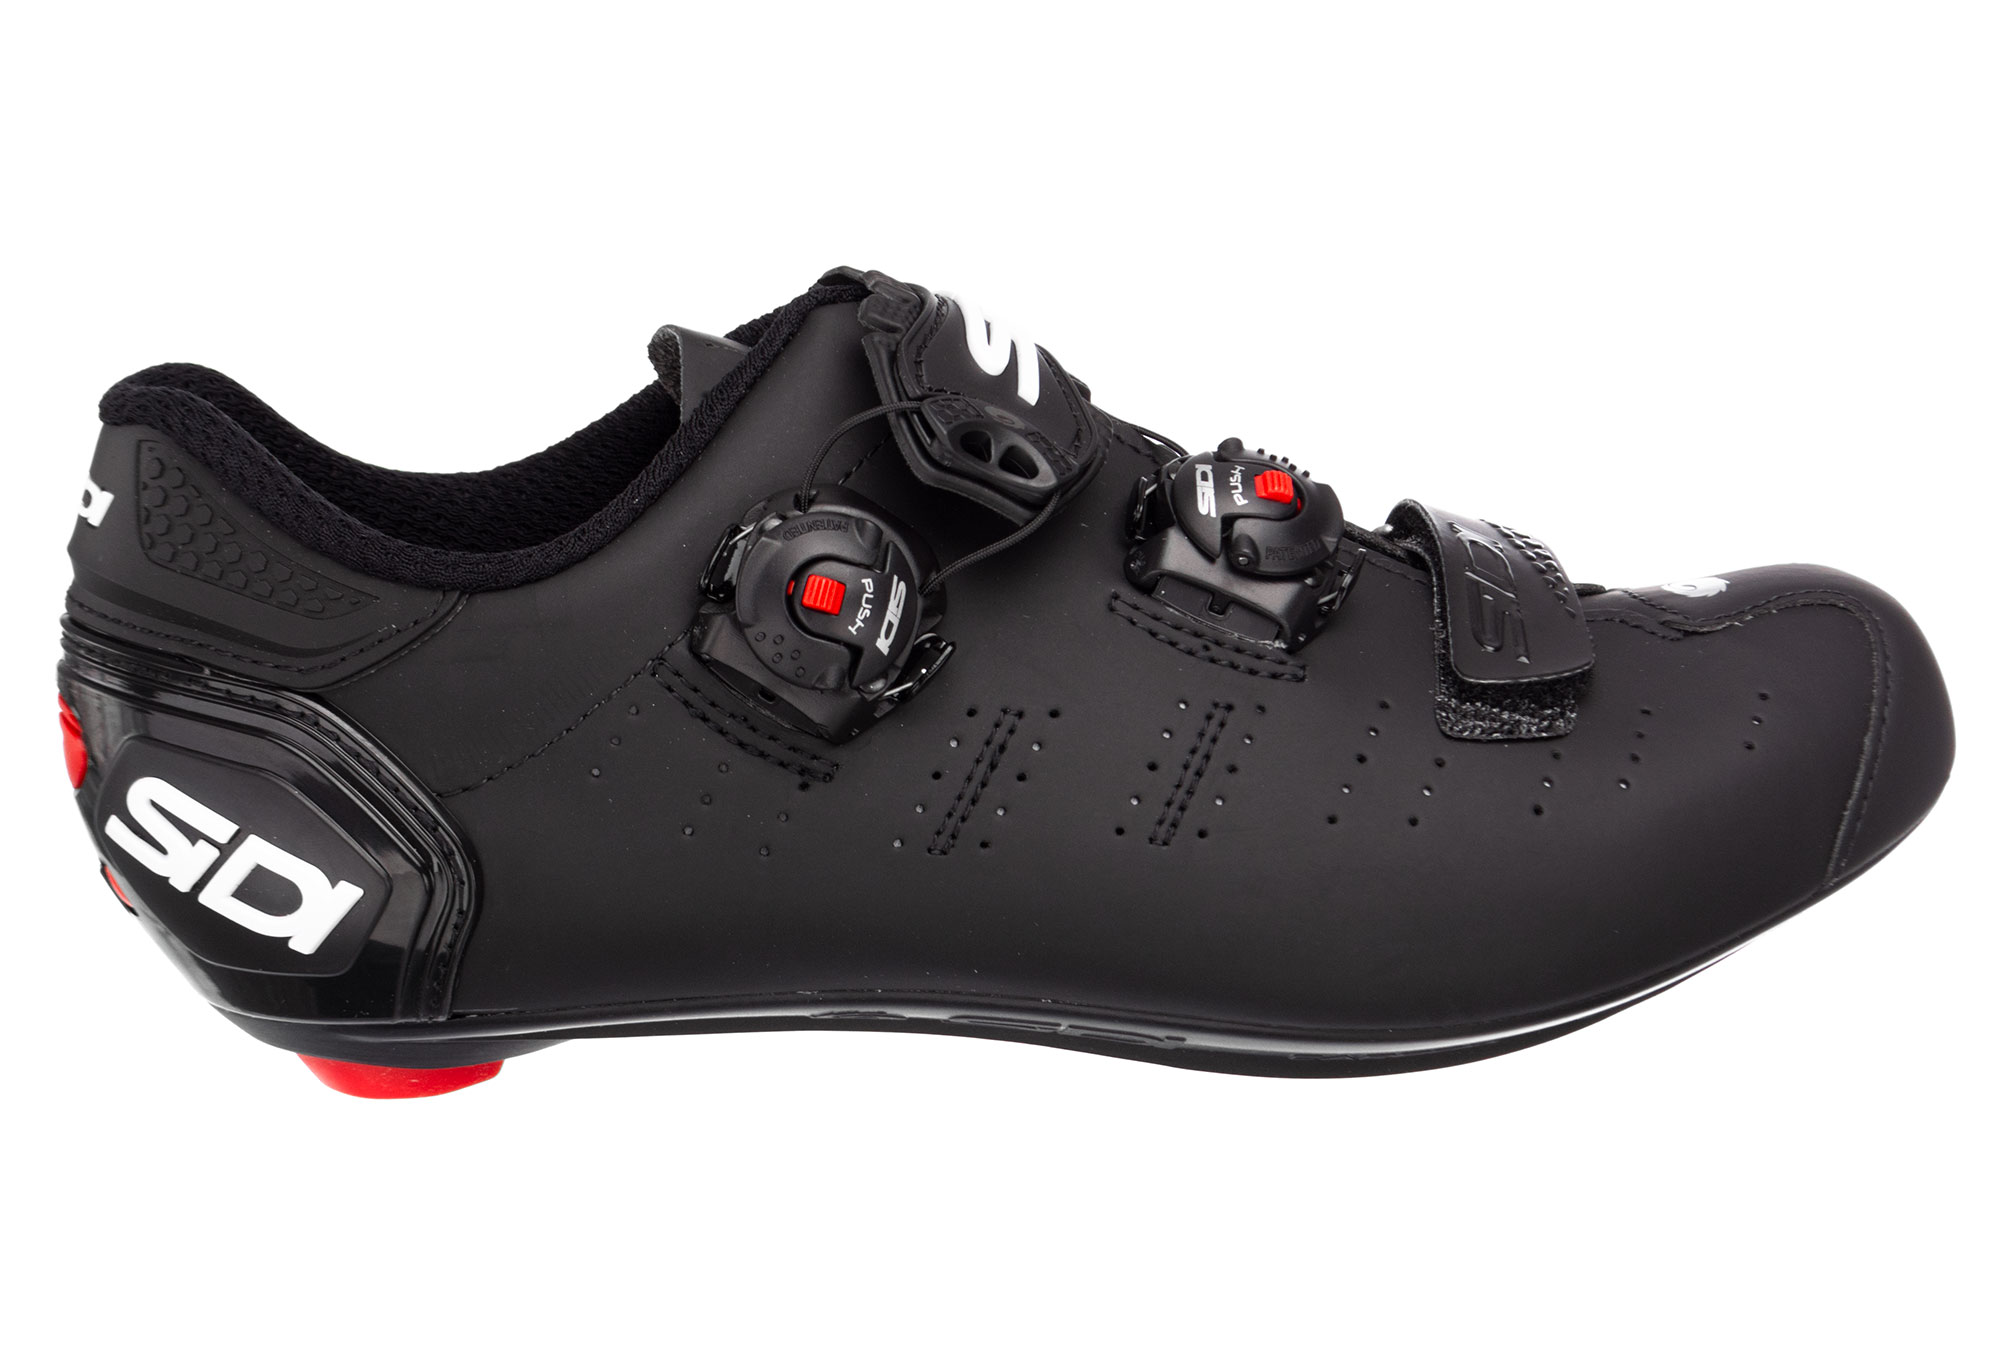 Chaussures Route Sidi Ergo 5 Mega Noir Mat